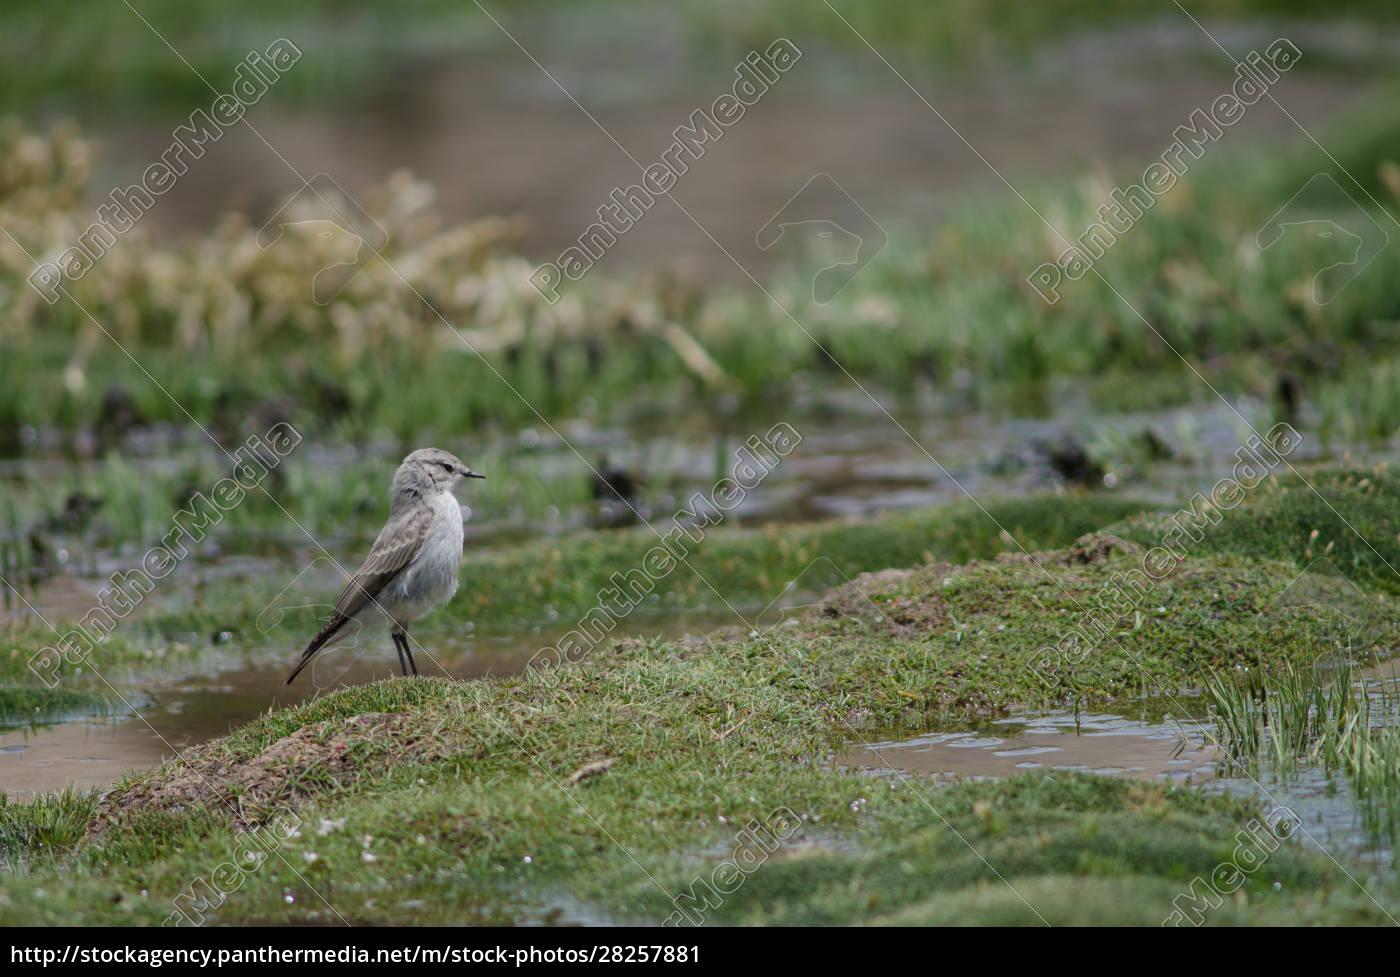 puna, ground, tyrant, muscisaxicola, juninensis, in - 28257881